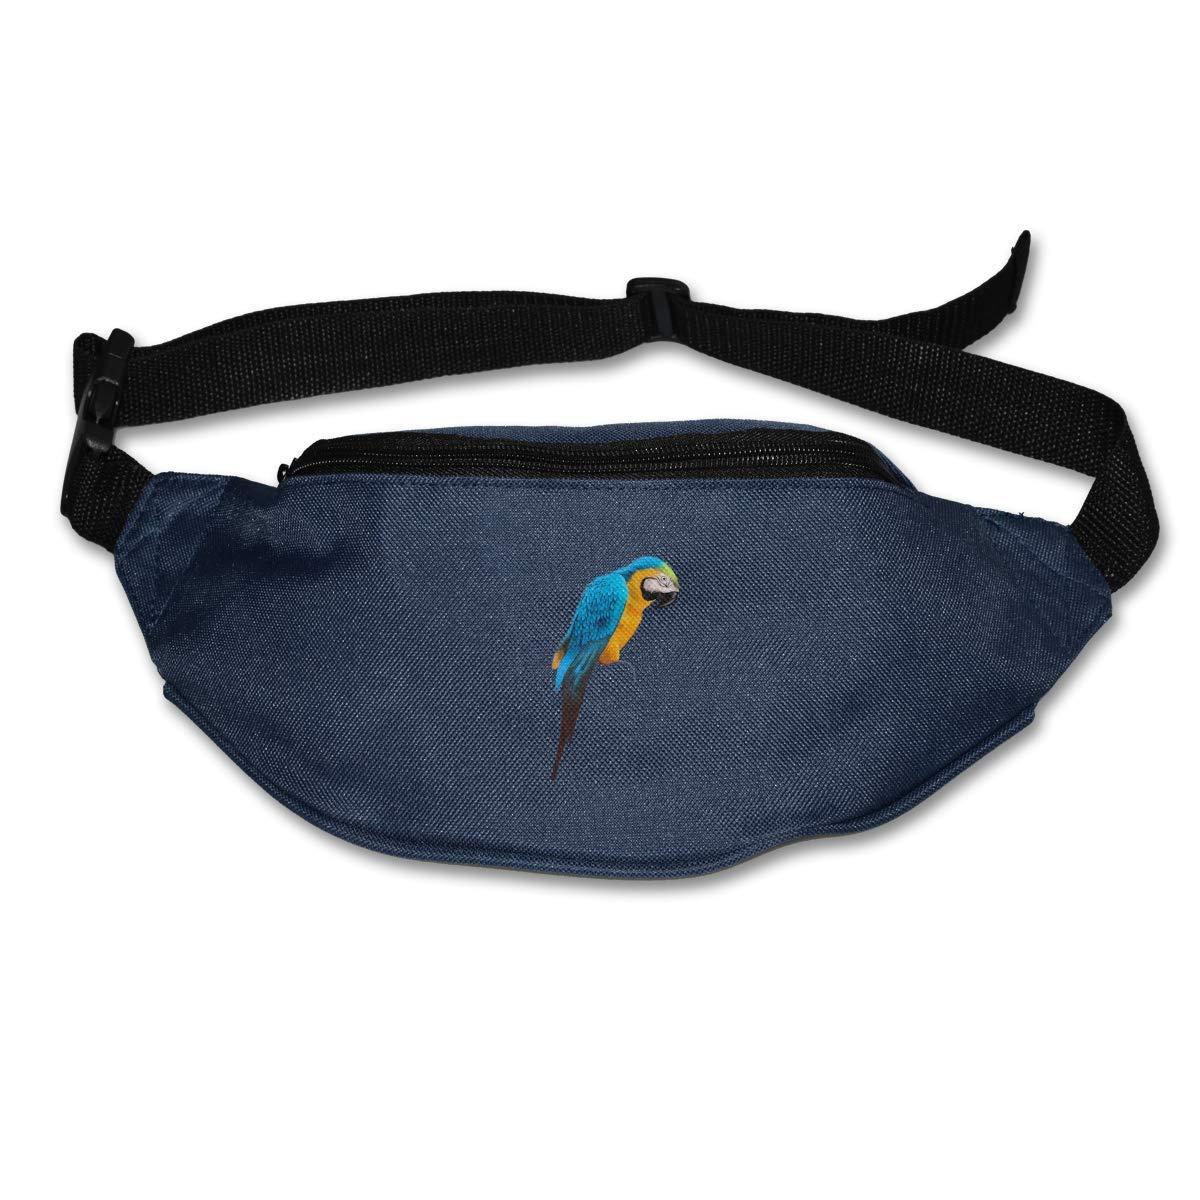 Waist Purse Colorful Lovely Parrot Art Unisex Outdoor Sports Pouch Fitness Runners Waist Bags